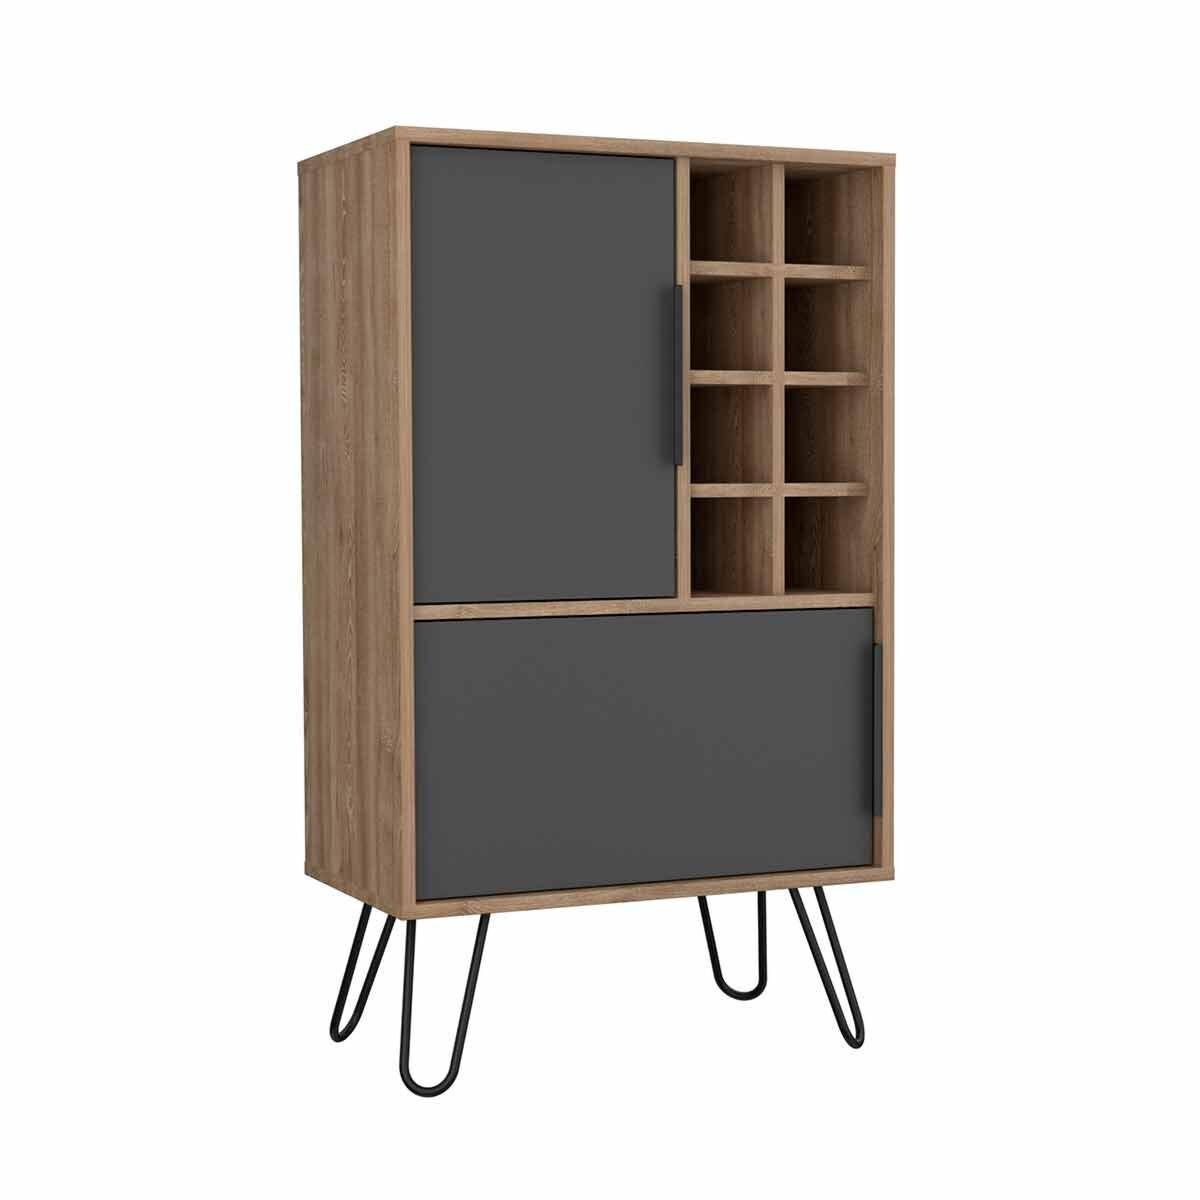 Vegas Medium Bar Cabinet with Hairpin Legs